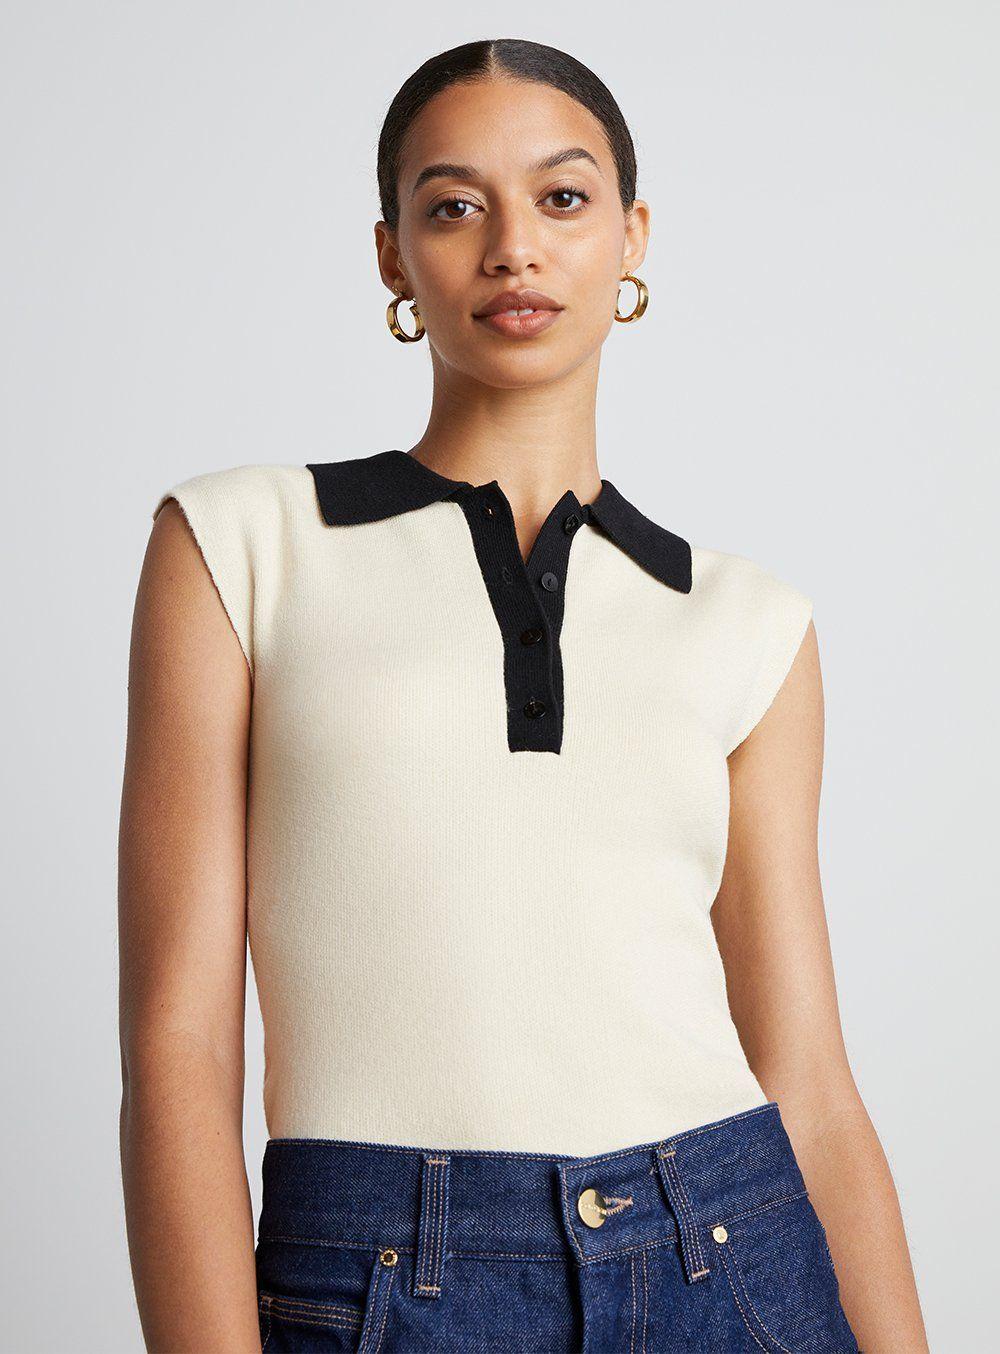 best new fashion items 286246 1629830400012